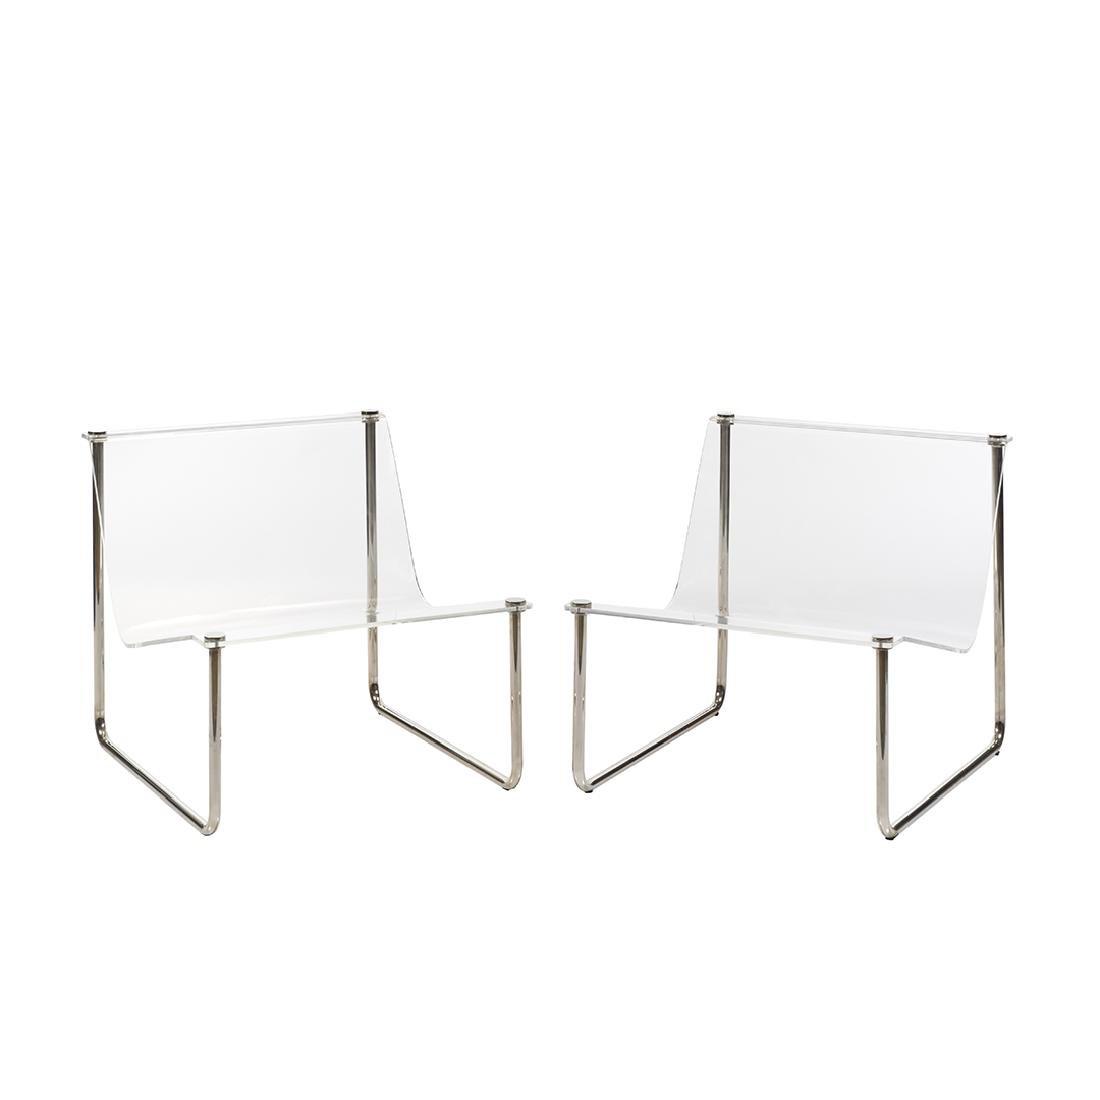 Charles Hollis Jones Sling chairs (2)